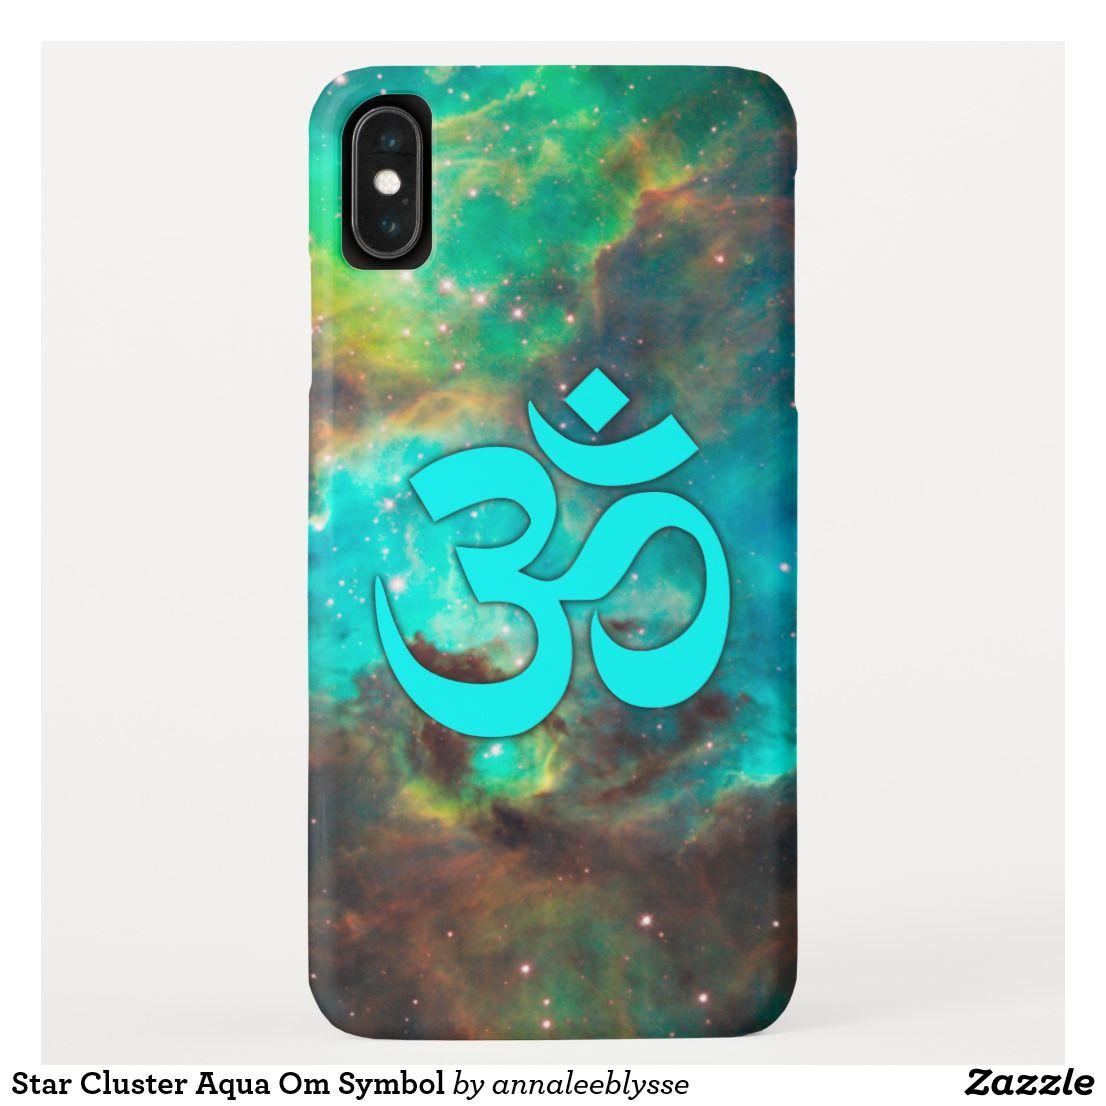 Star Cluster Aqua Om Symbol Iphone Xs Max Case